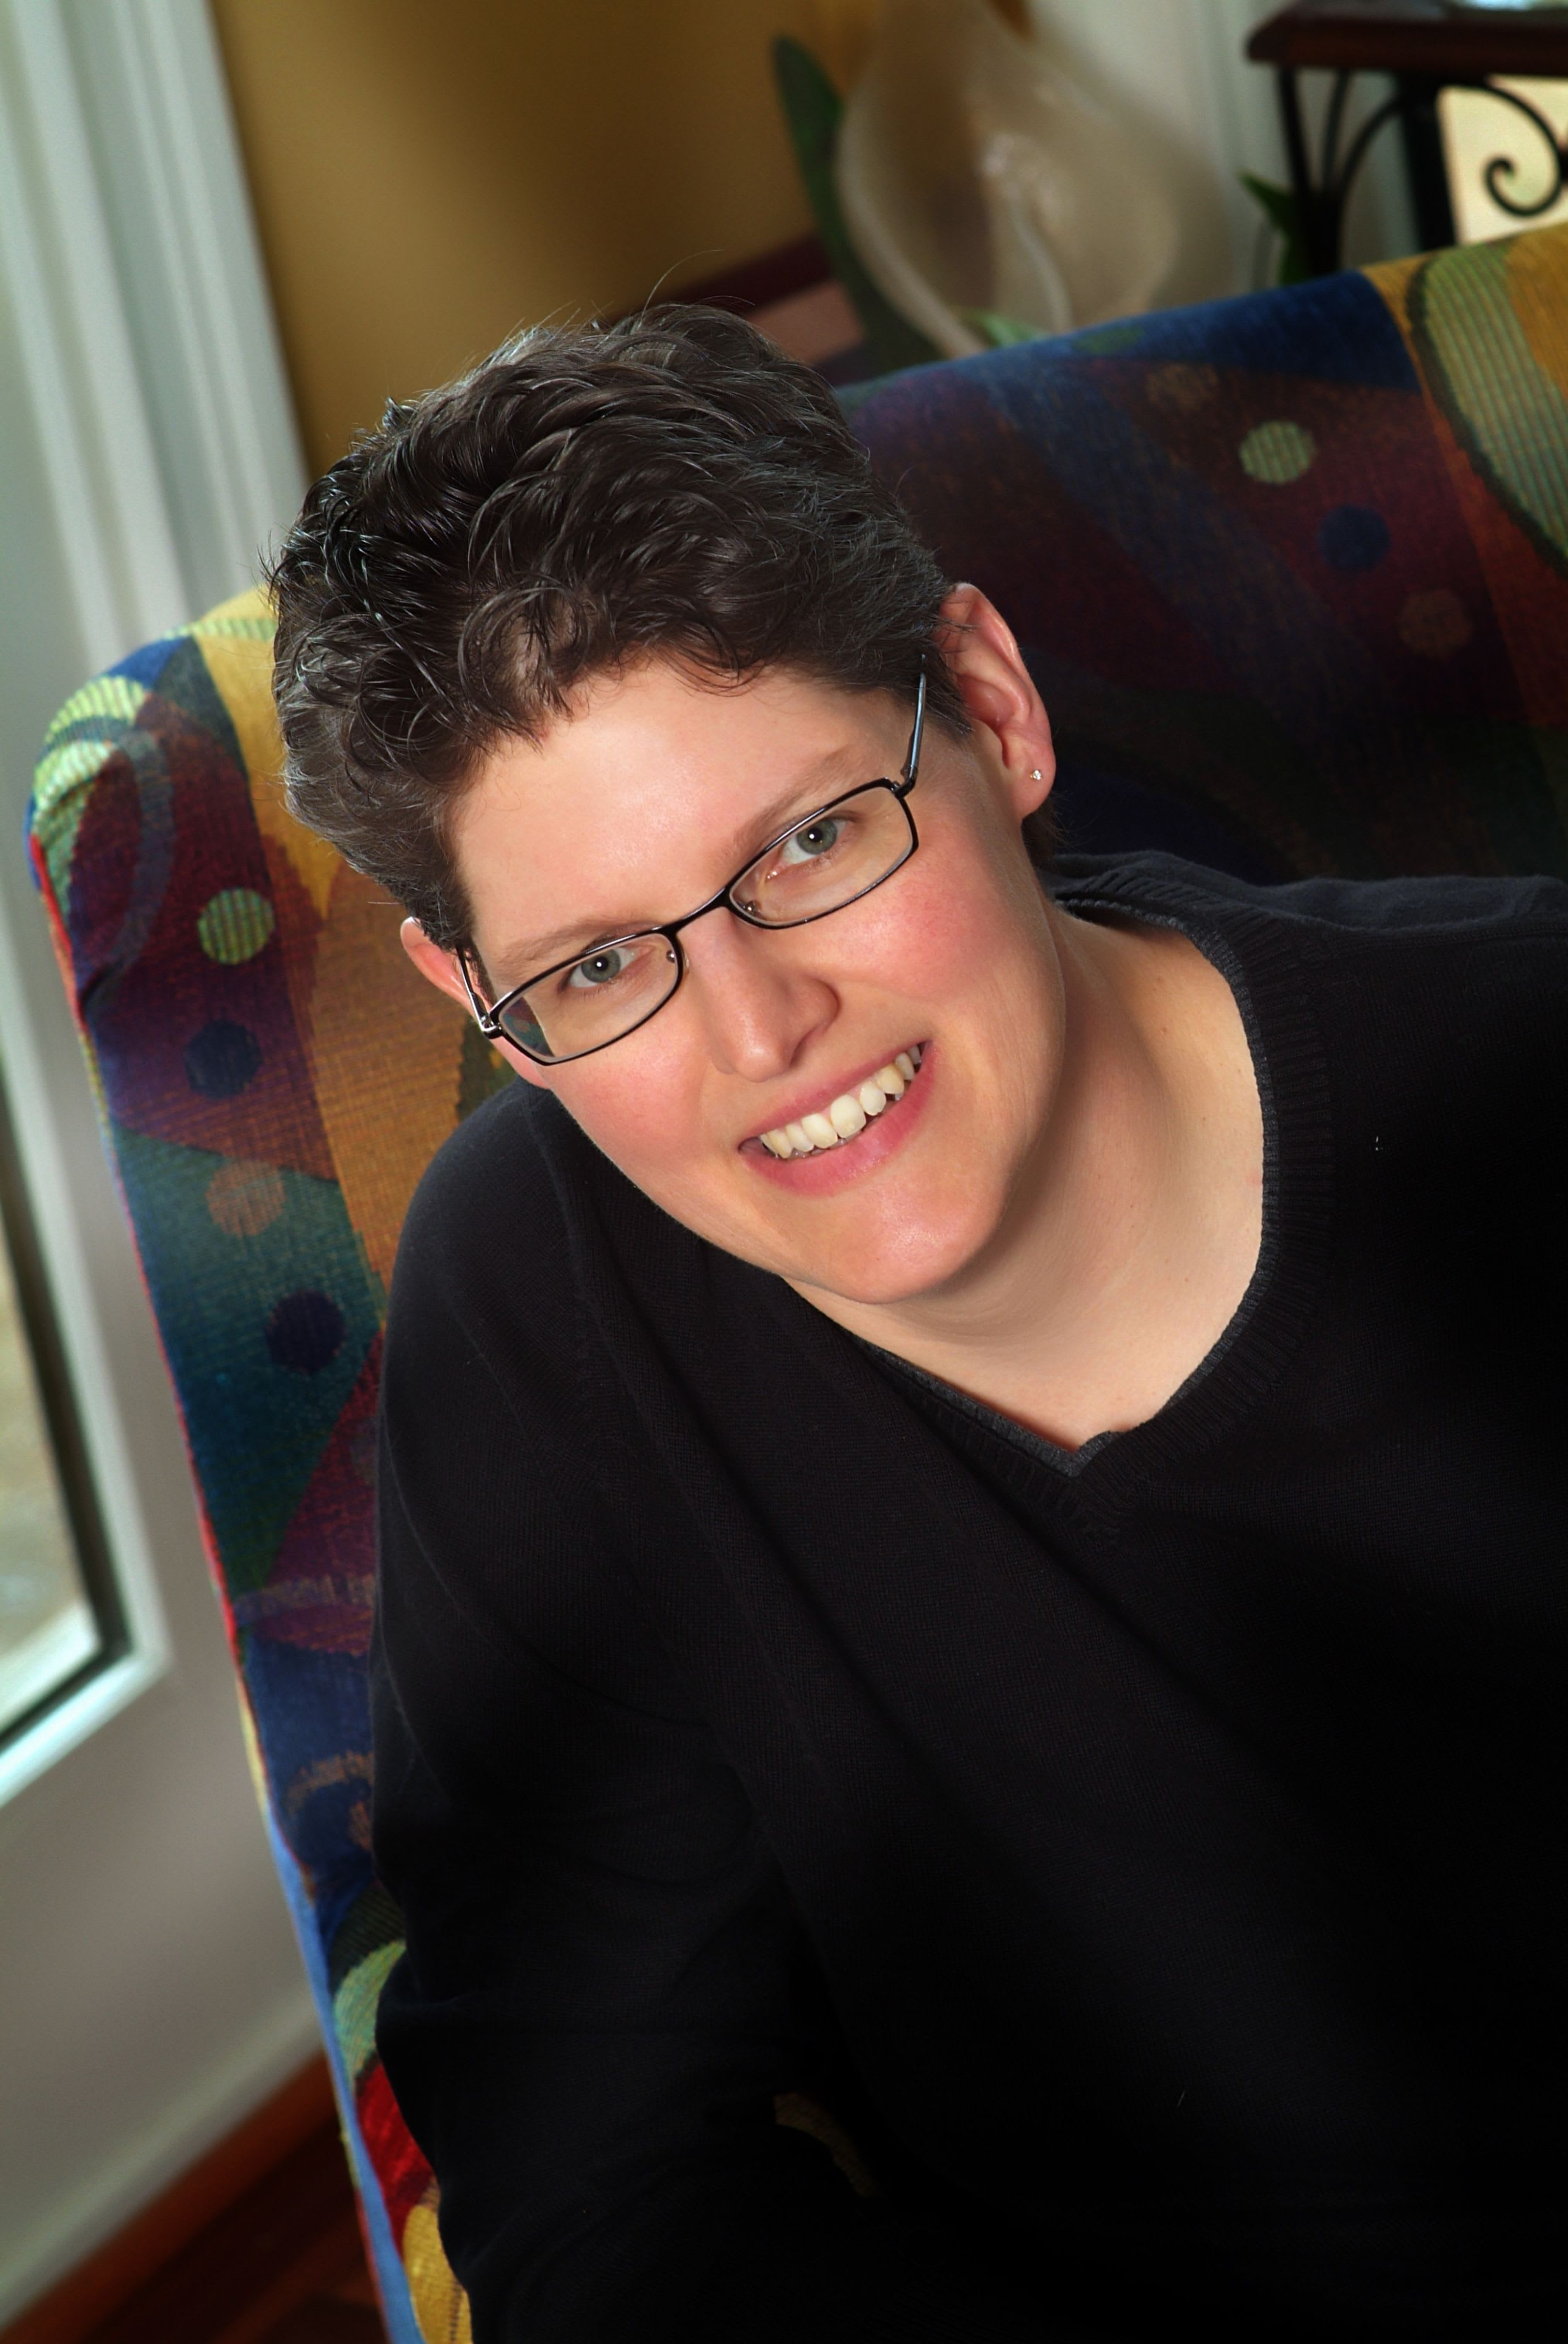 Eileen April Boylan